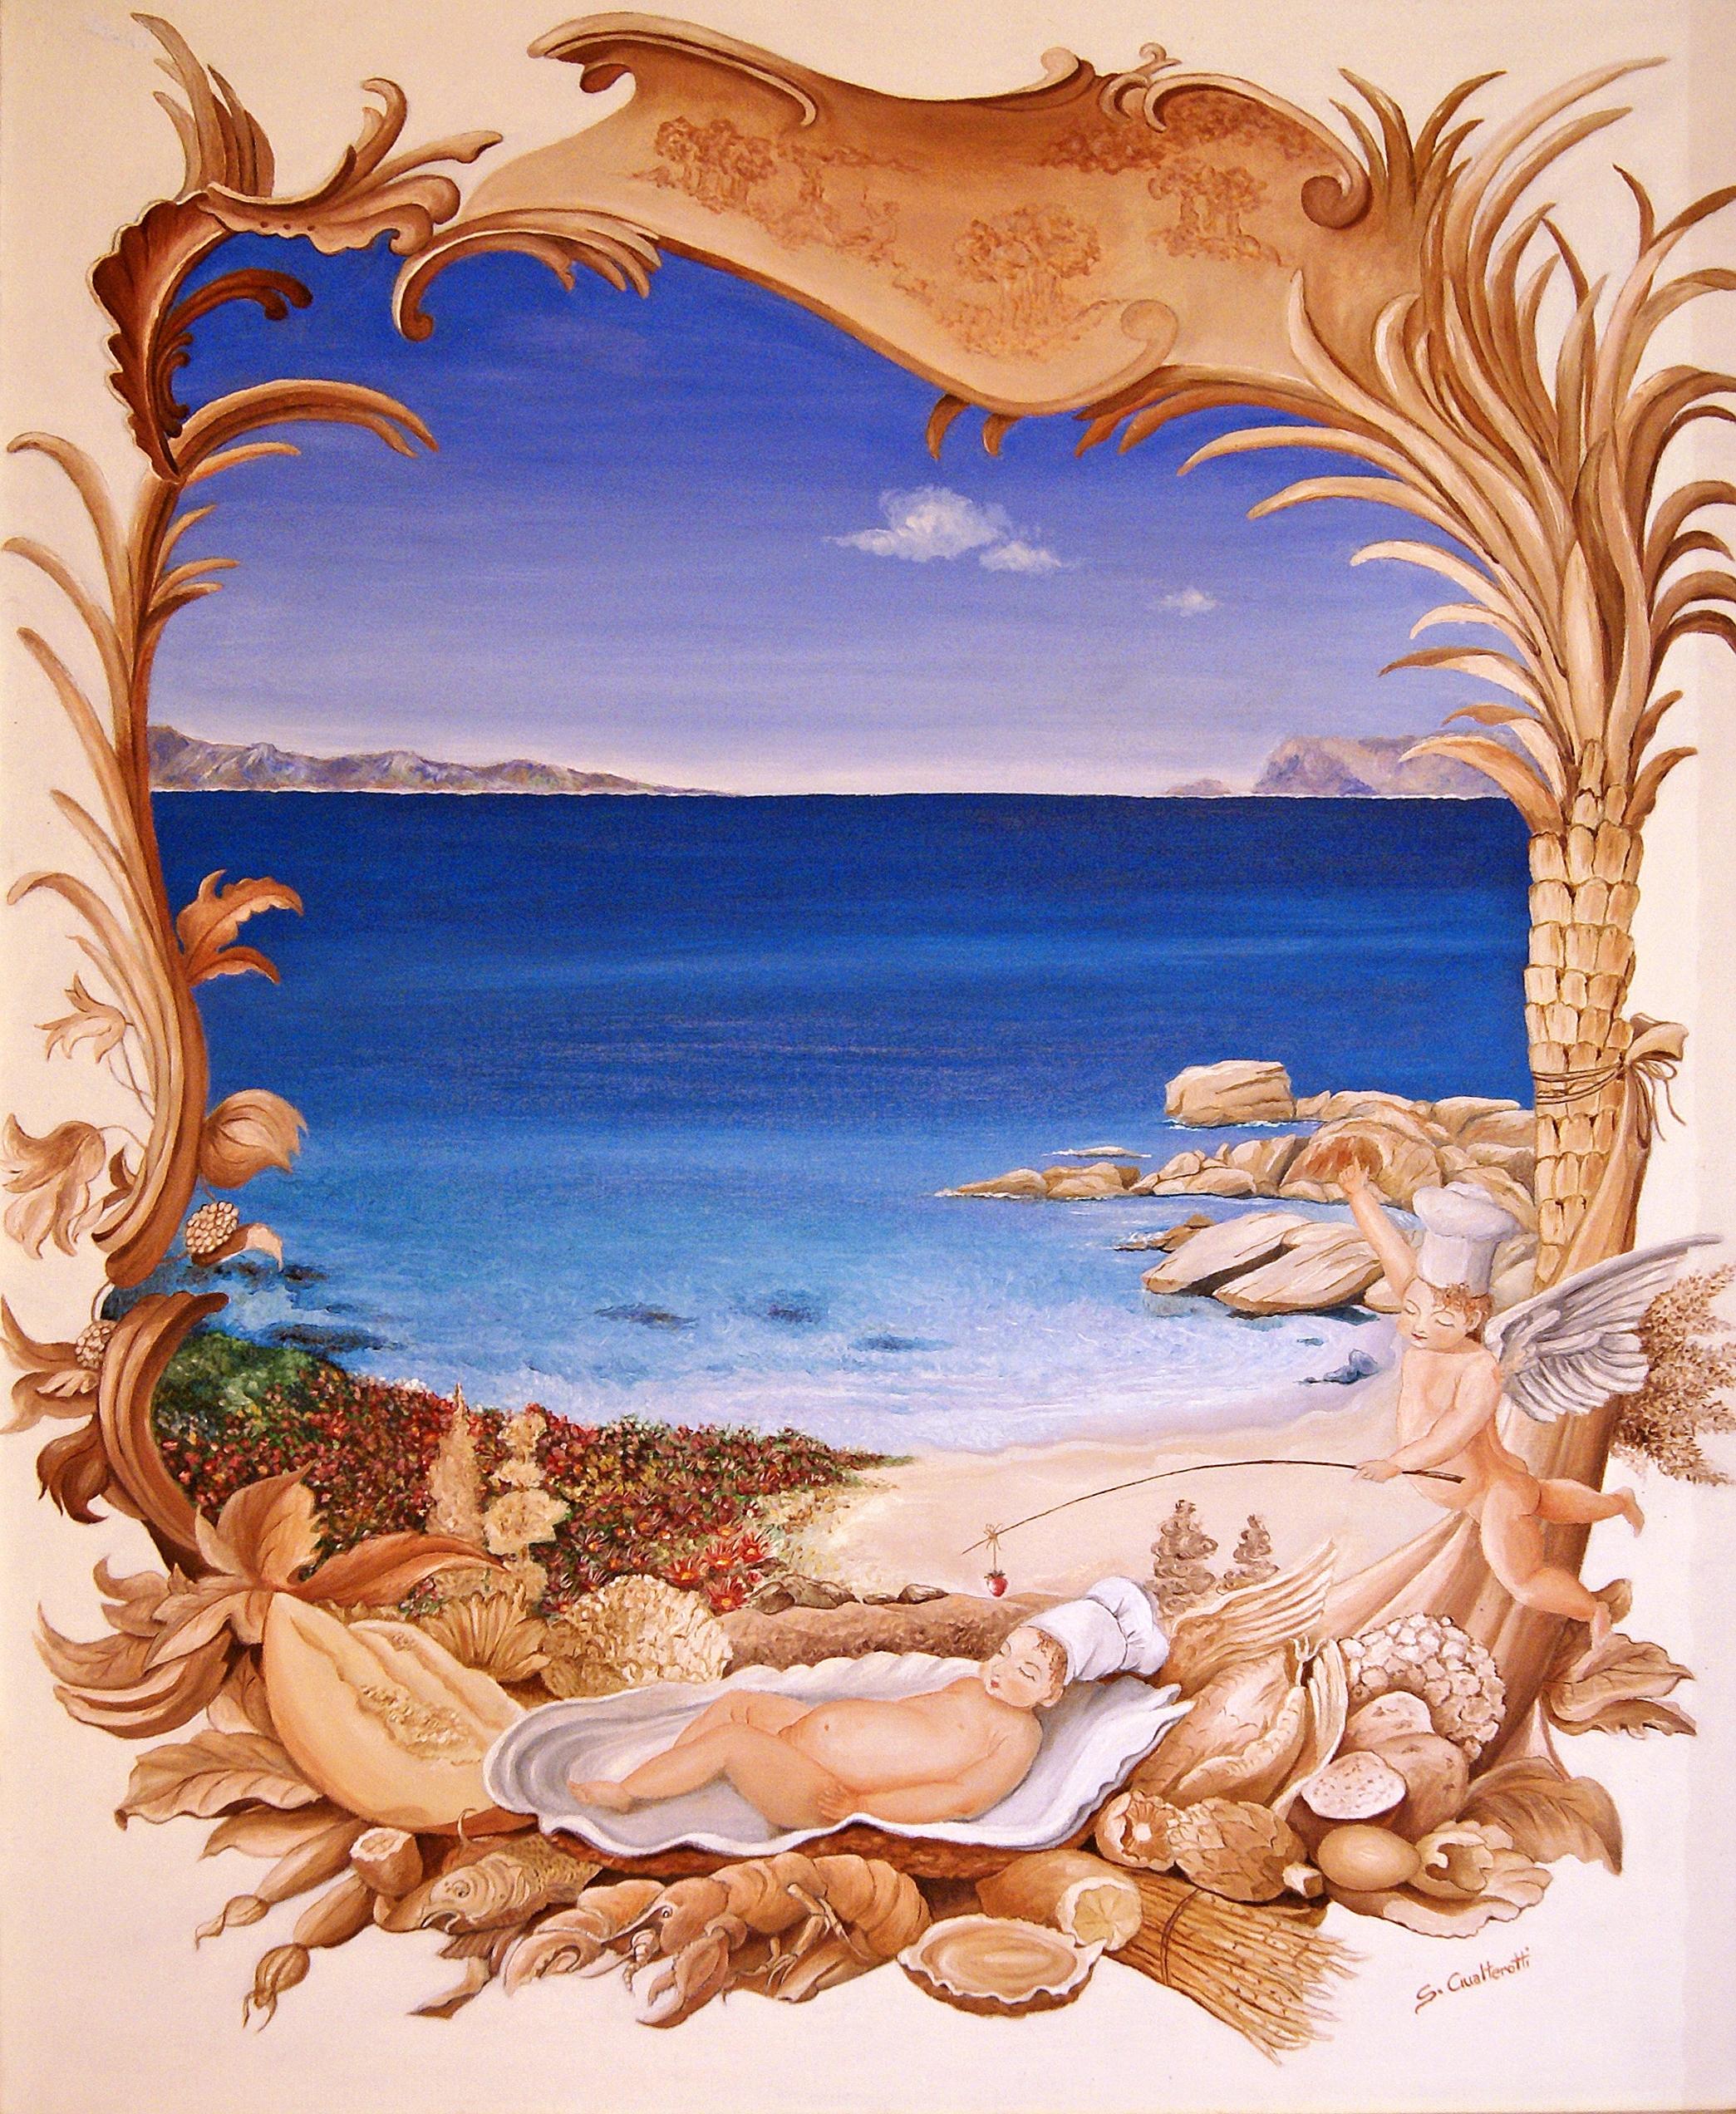 Amorini cuochi in relax -olio si tela 70 x 100